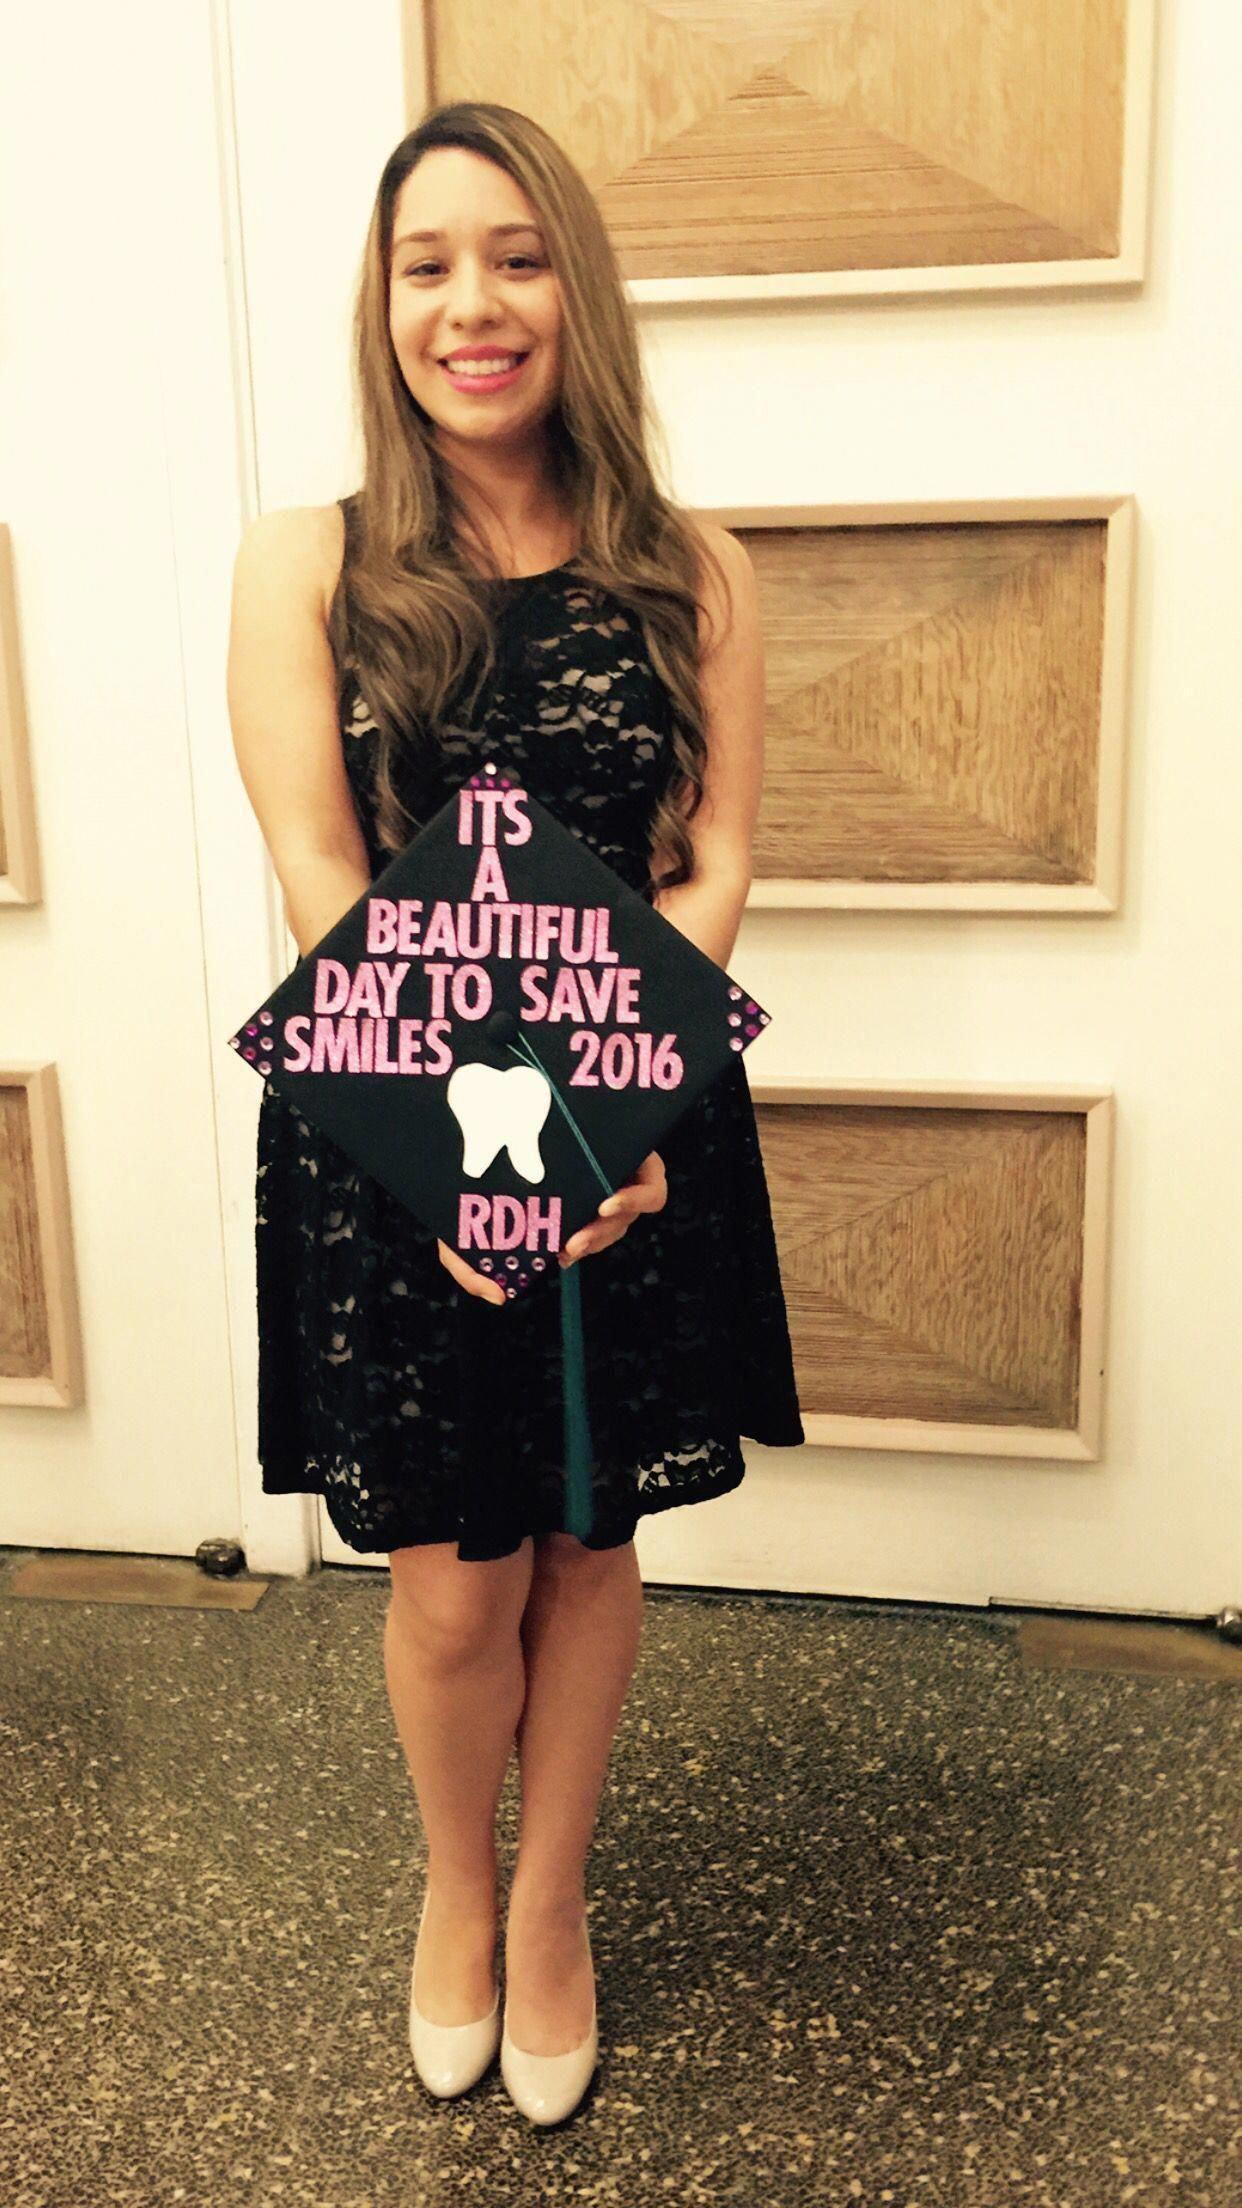 Dental School Graduation Gift Ideas For Her  Impolite Dental Hygienist Posts dentalImplants